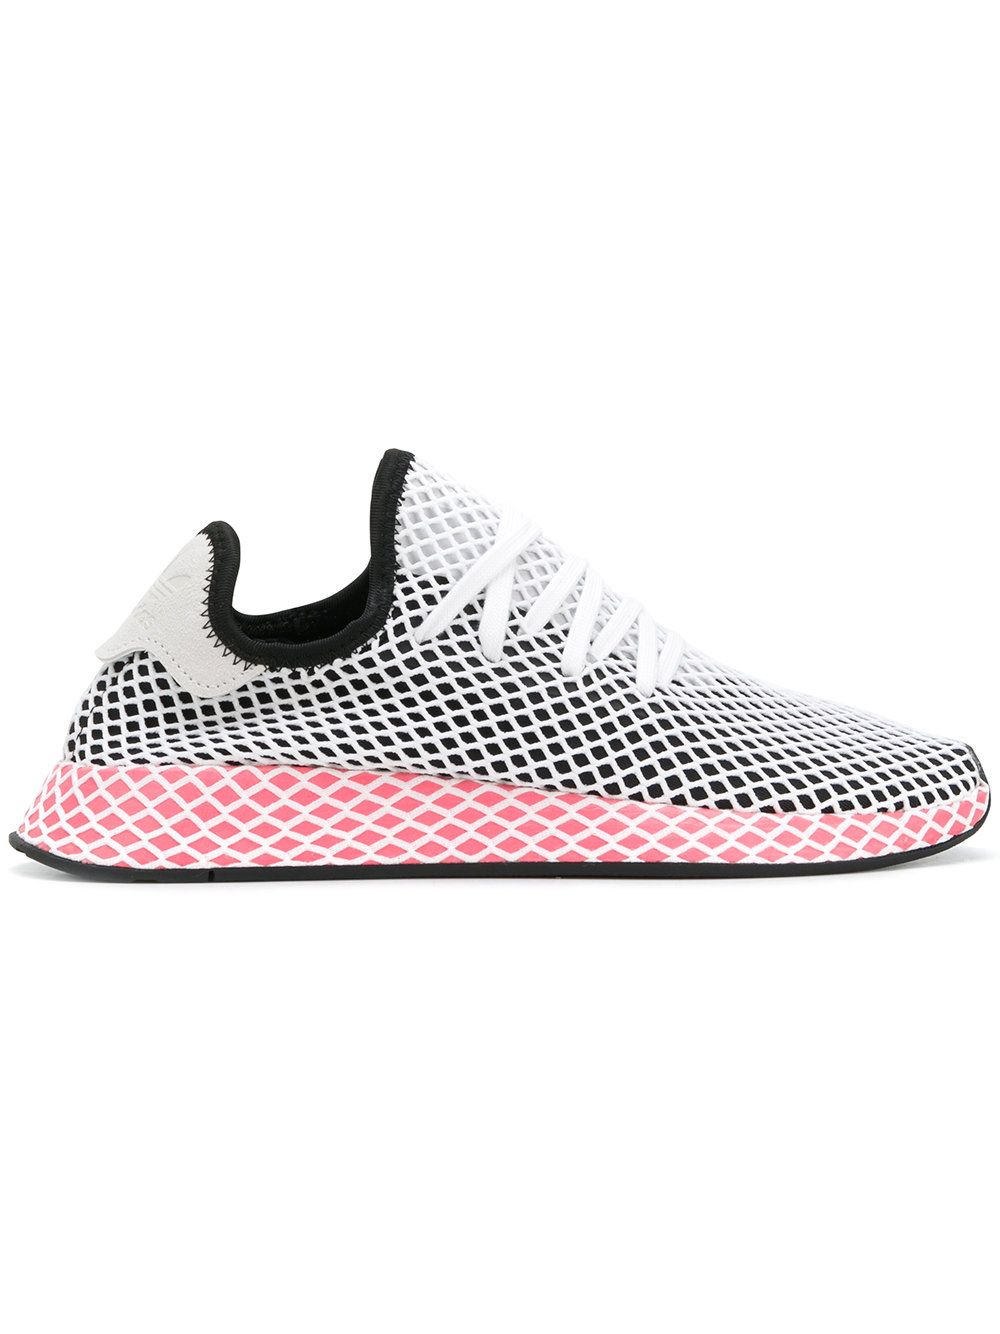 lowest price 250f5 53781 Adidas Deerupt running sneakers